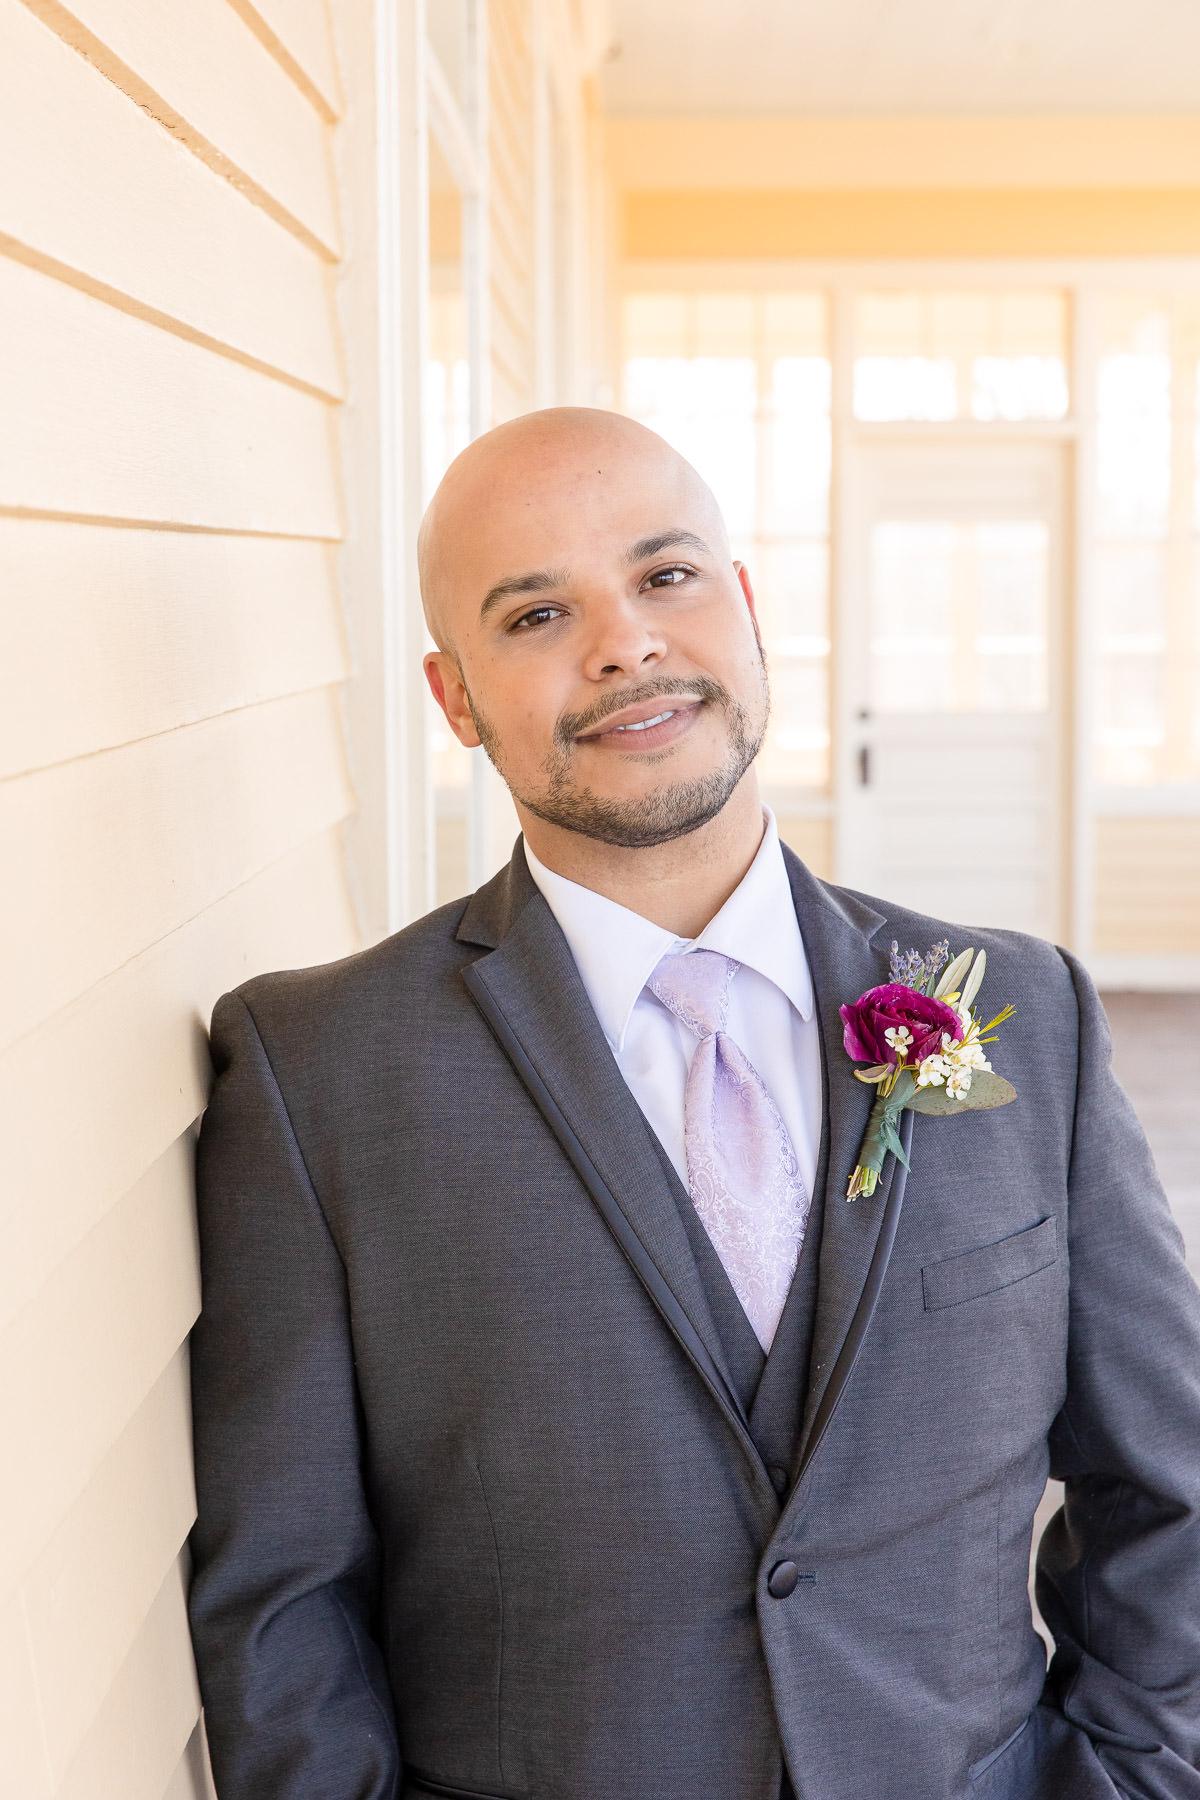 Eisenhower House, Newport, Rhode Island, Tracy Jenkins Photography, wedding, LGBTQ+, LGBT, Gay, Inclusive, Photography, Wedding photography, groom, portrait